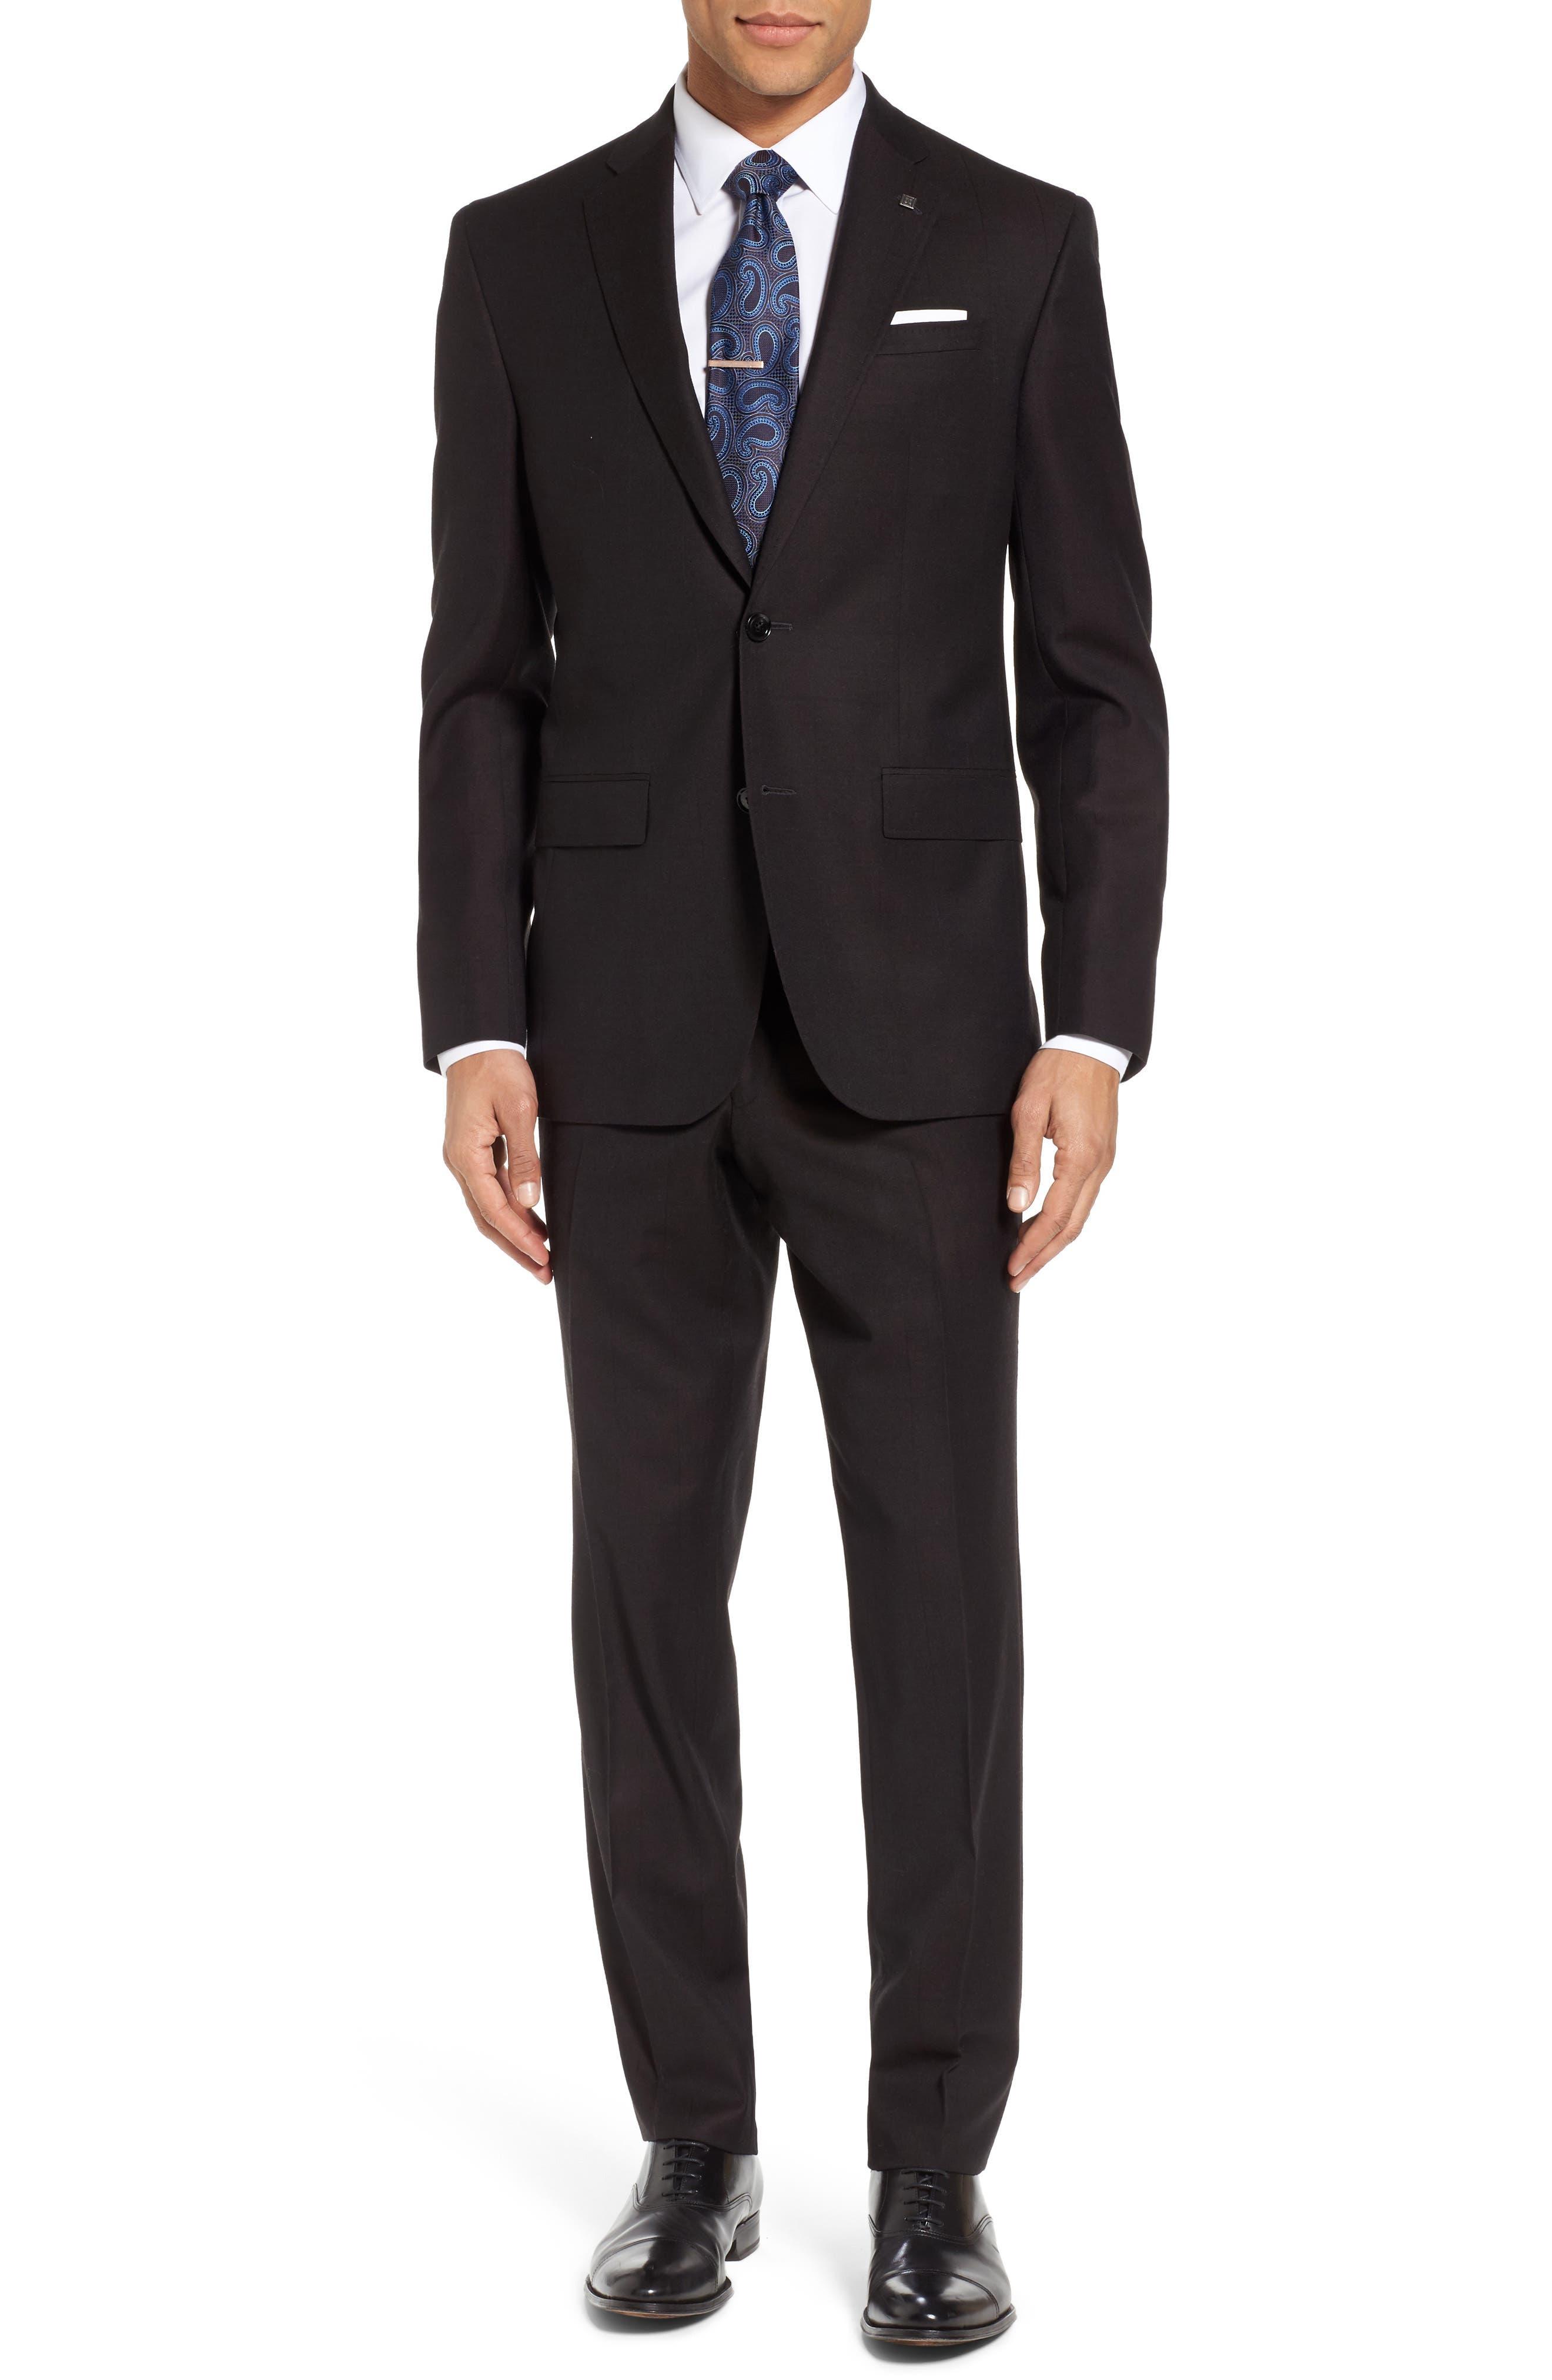 Jay Trim Fit Solid Wool Suit,                         Main,                         color, 200